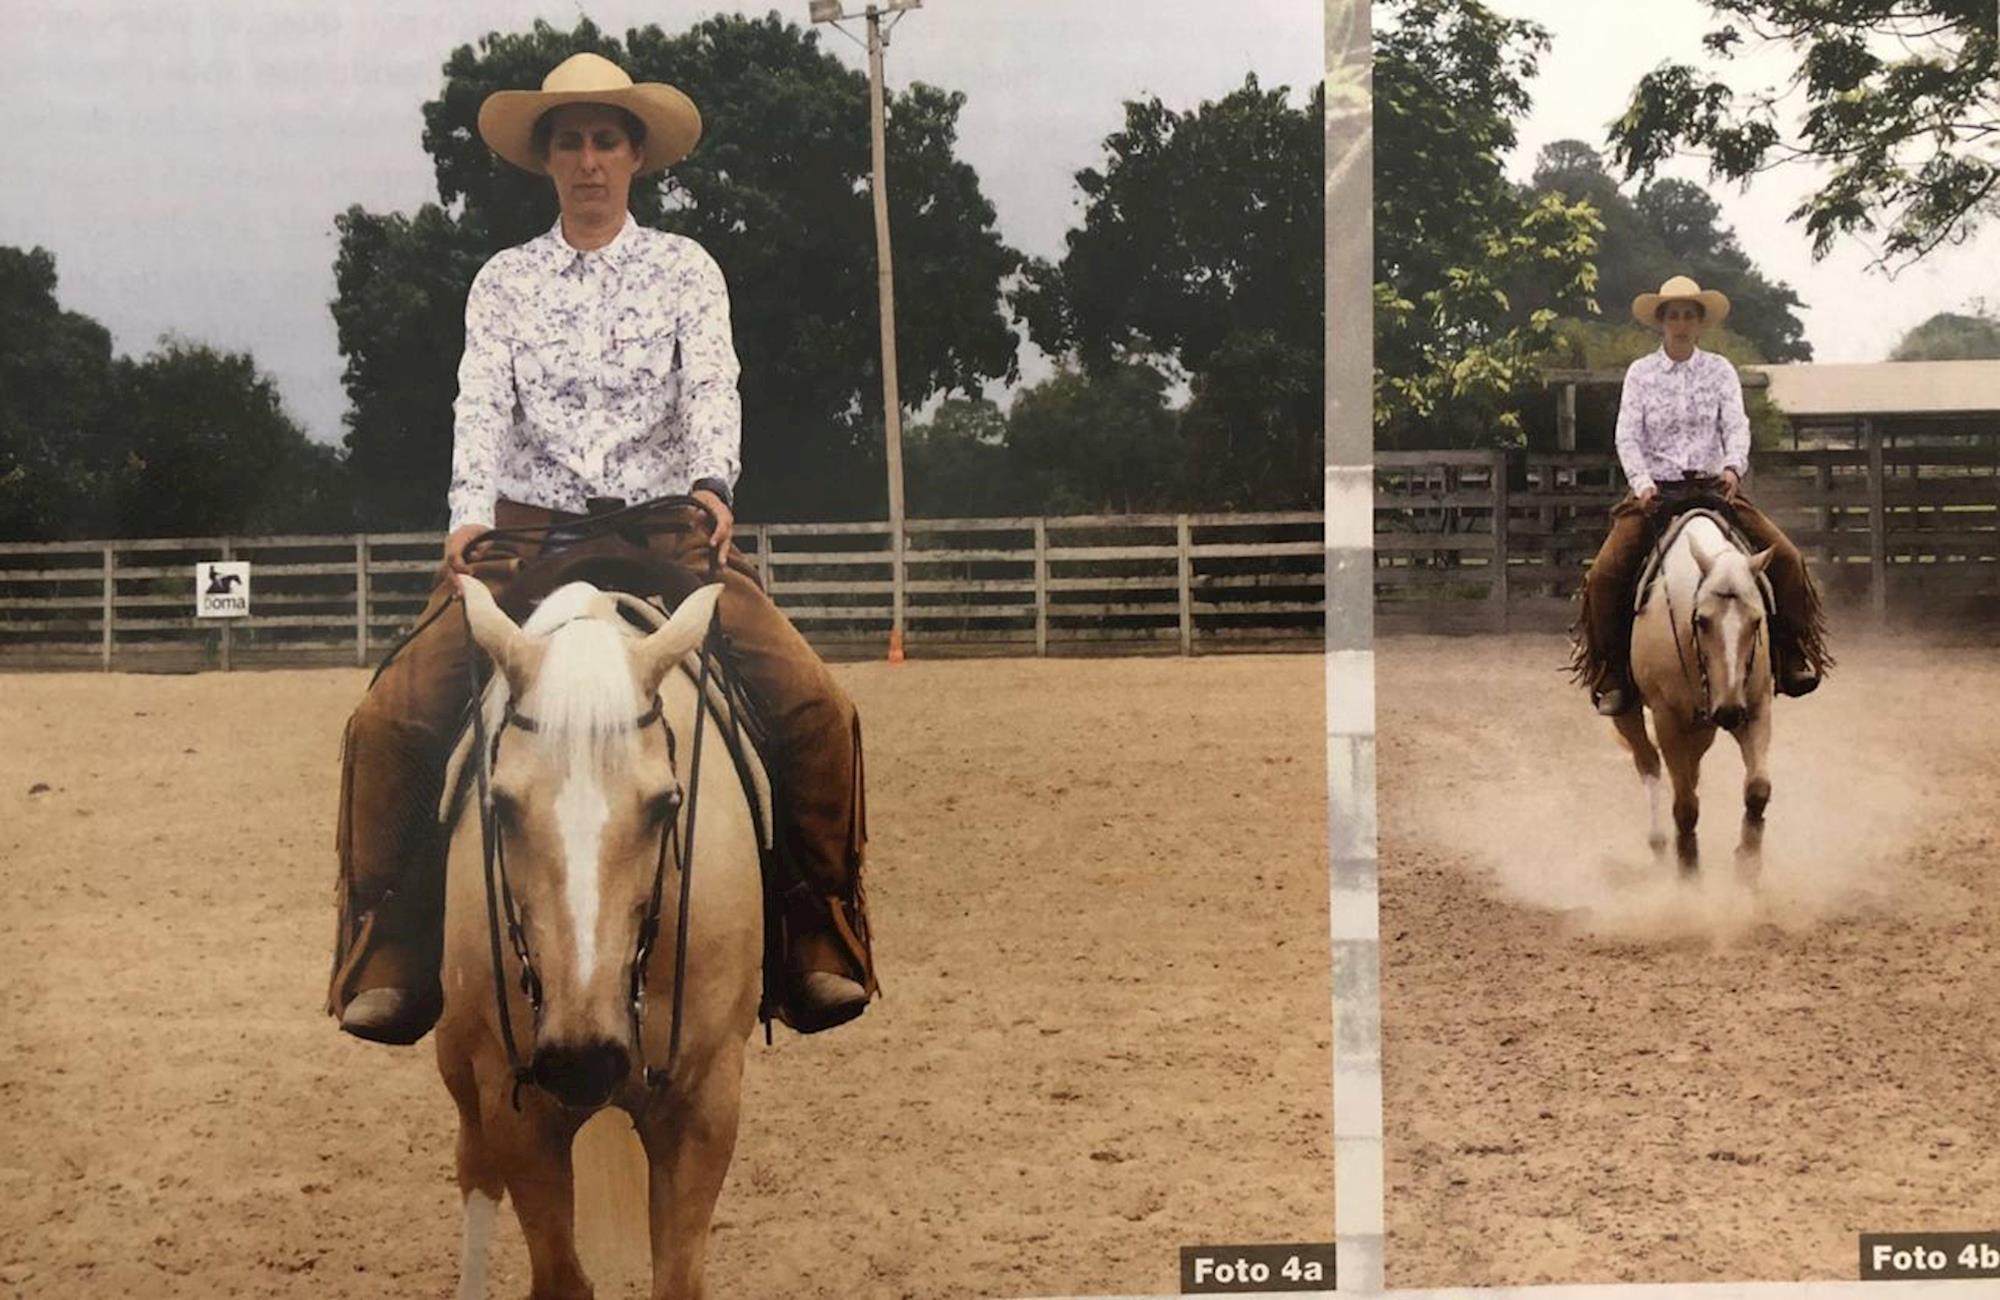 Dudi, Treinamento, cavalos, Doma, Horse,